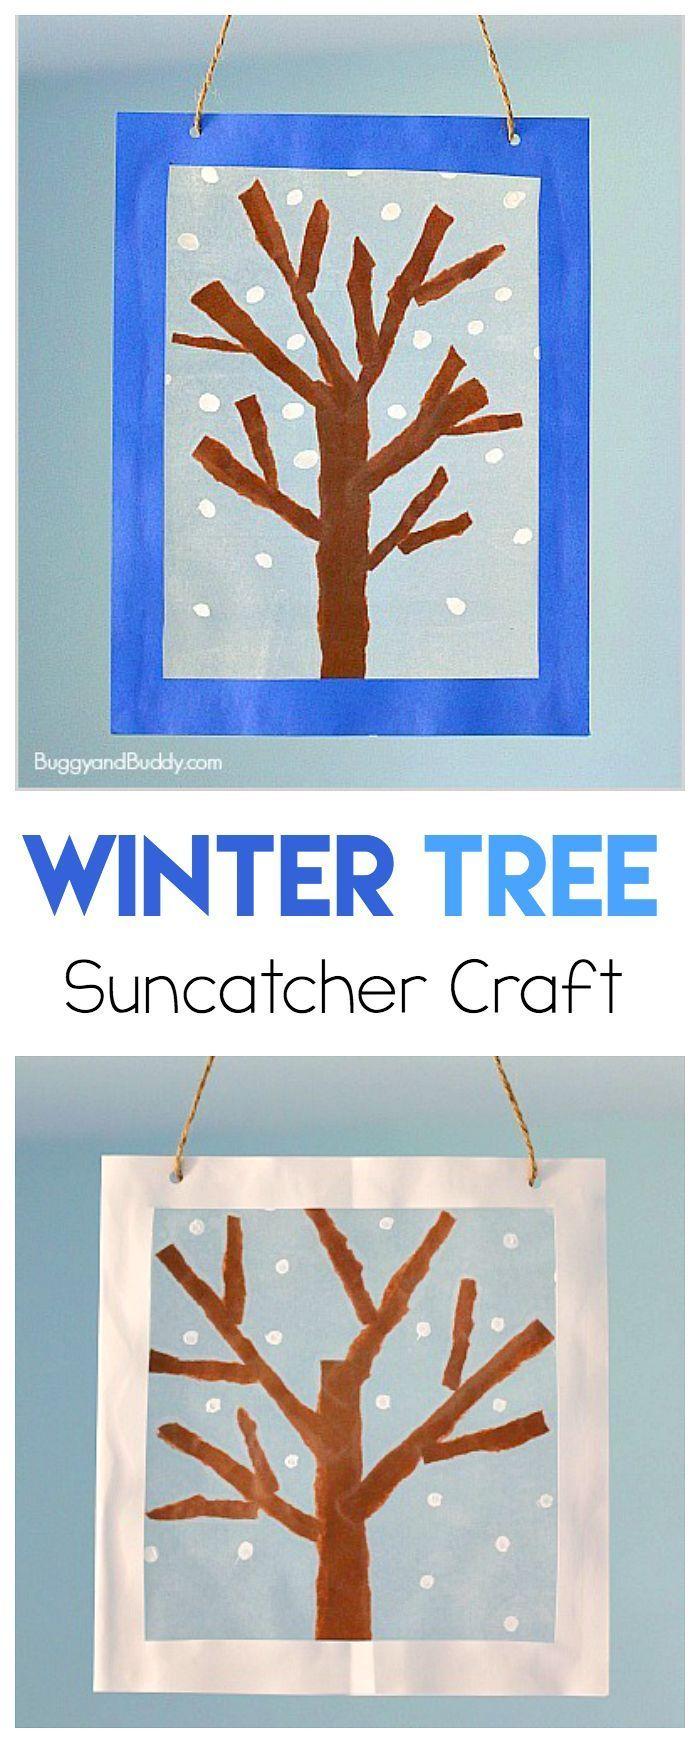 Easy Winter Kids Crafts That Anyone Can Make: Winter Tree Suncatcher Craft Using Tear Art